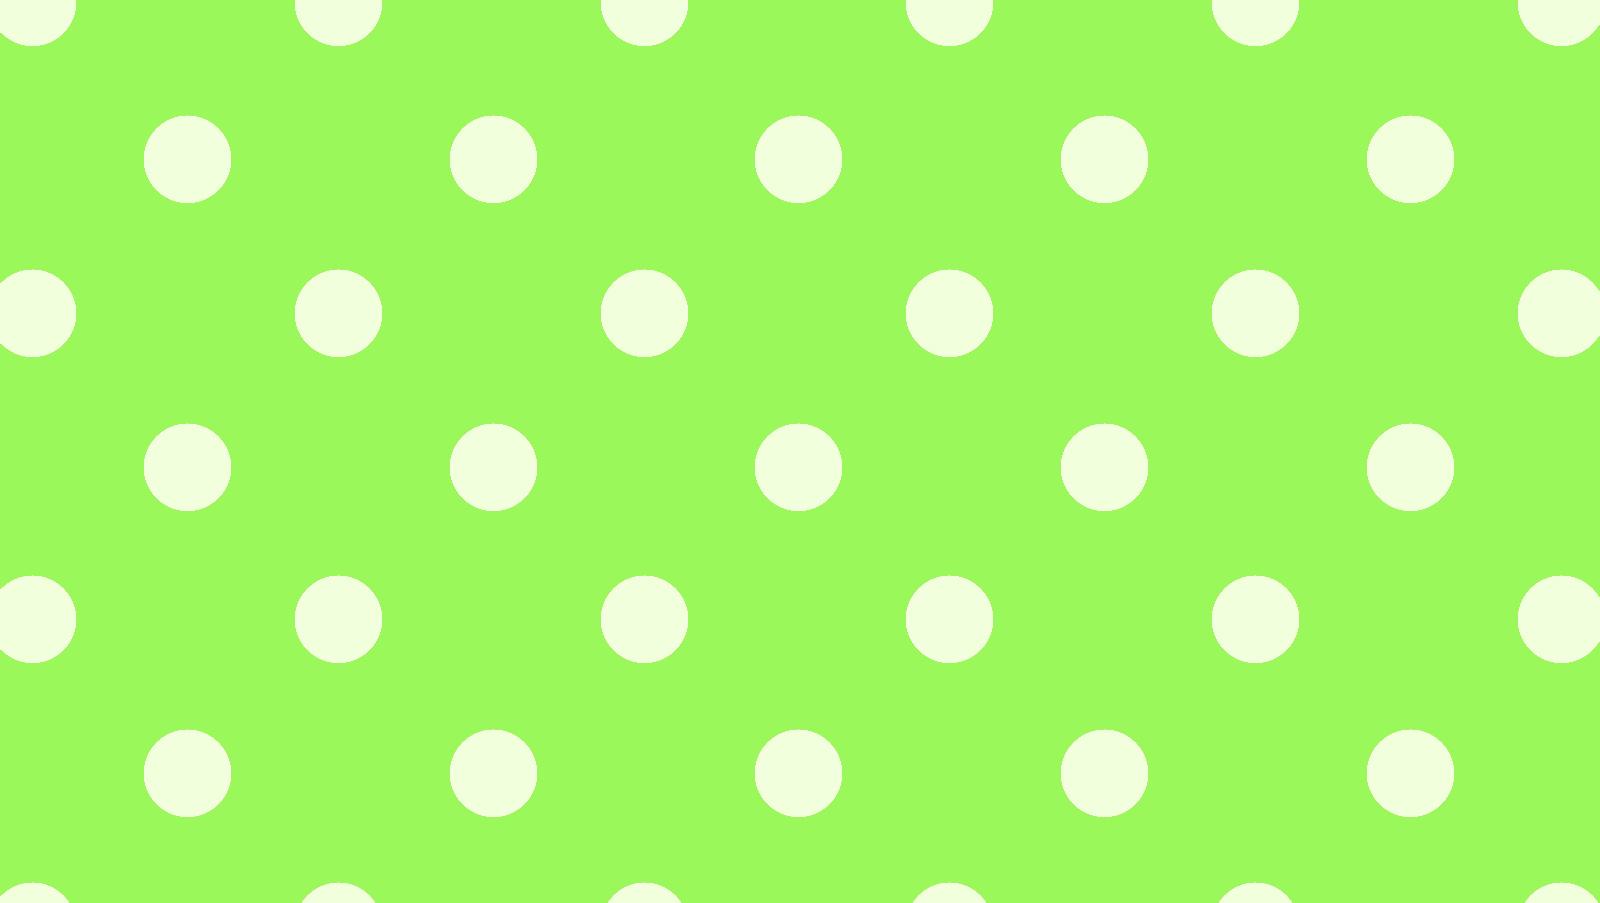 HD Polka Dot Wallpaper  WallpaperSafari